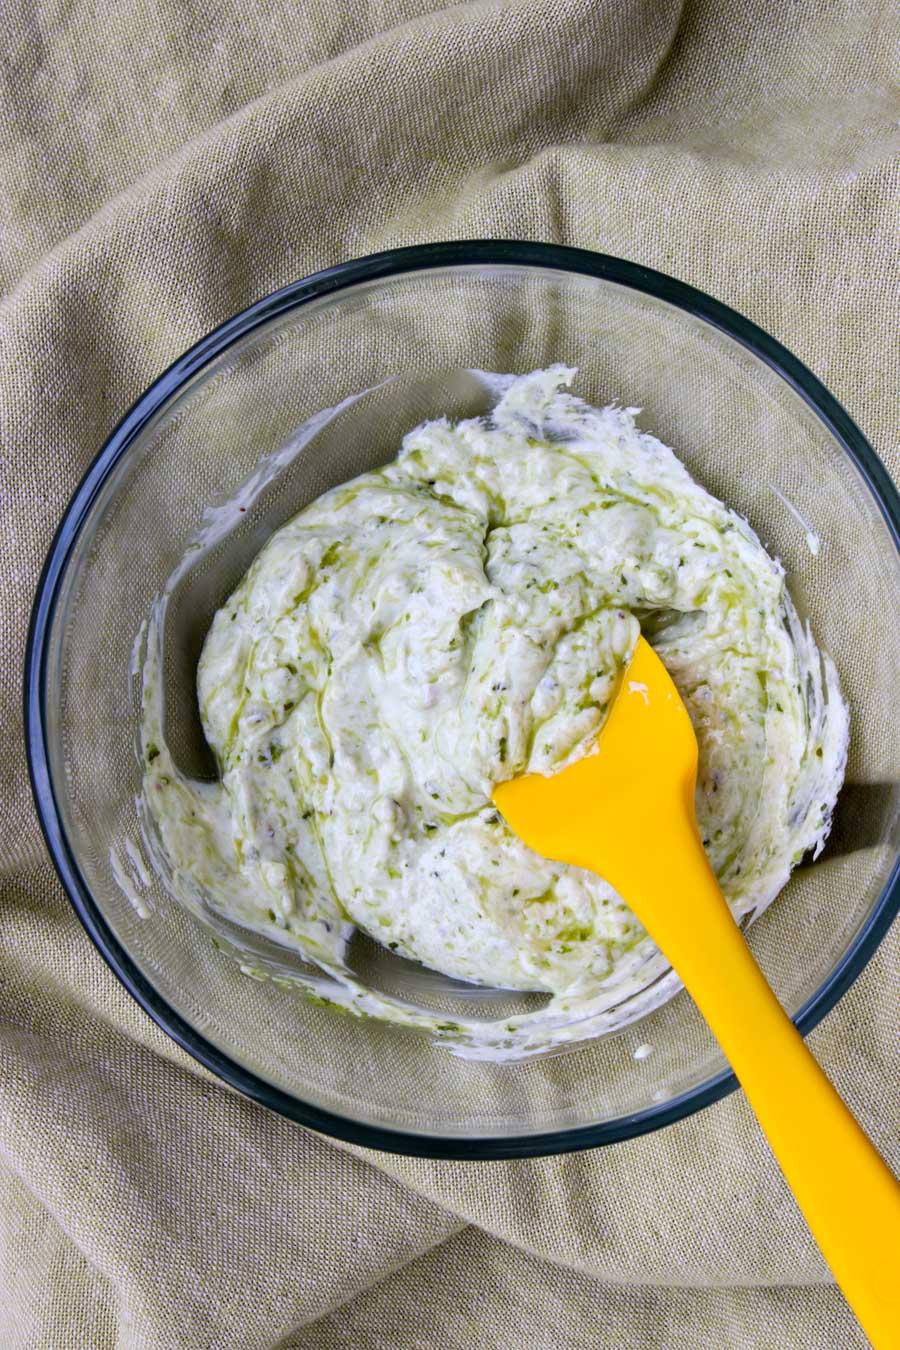 bowl of pesto yogurt dip with a yellow spook